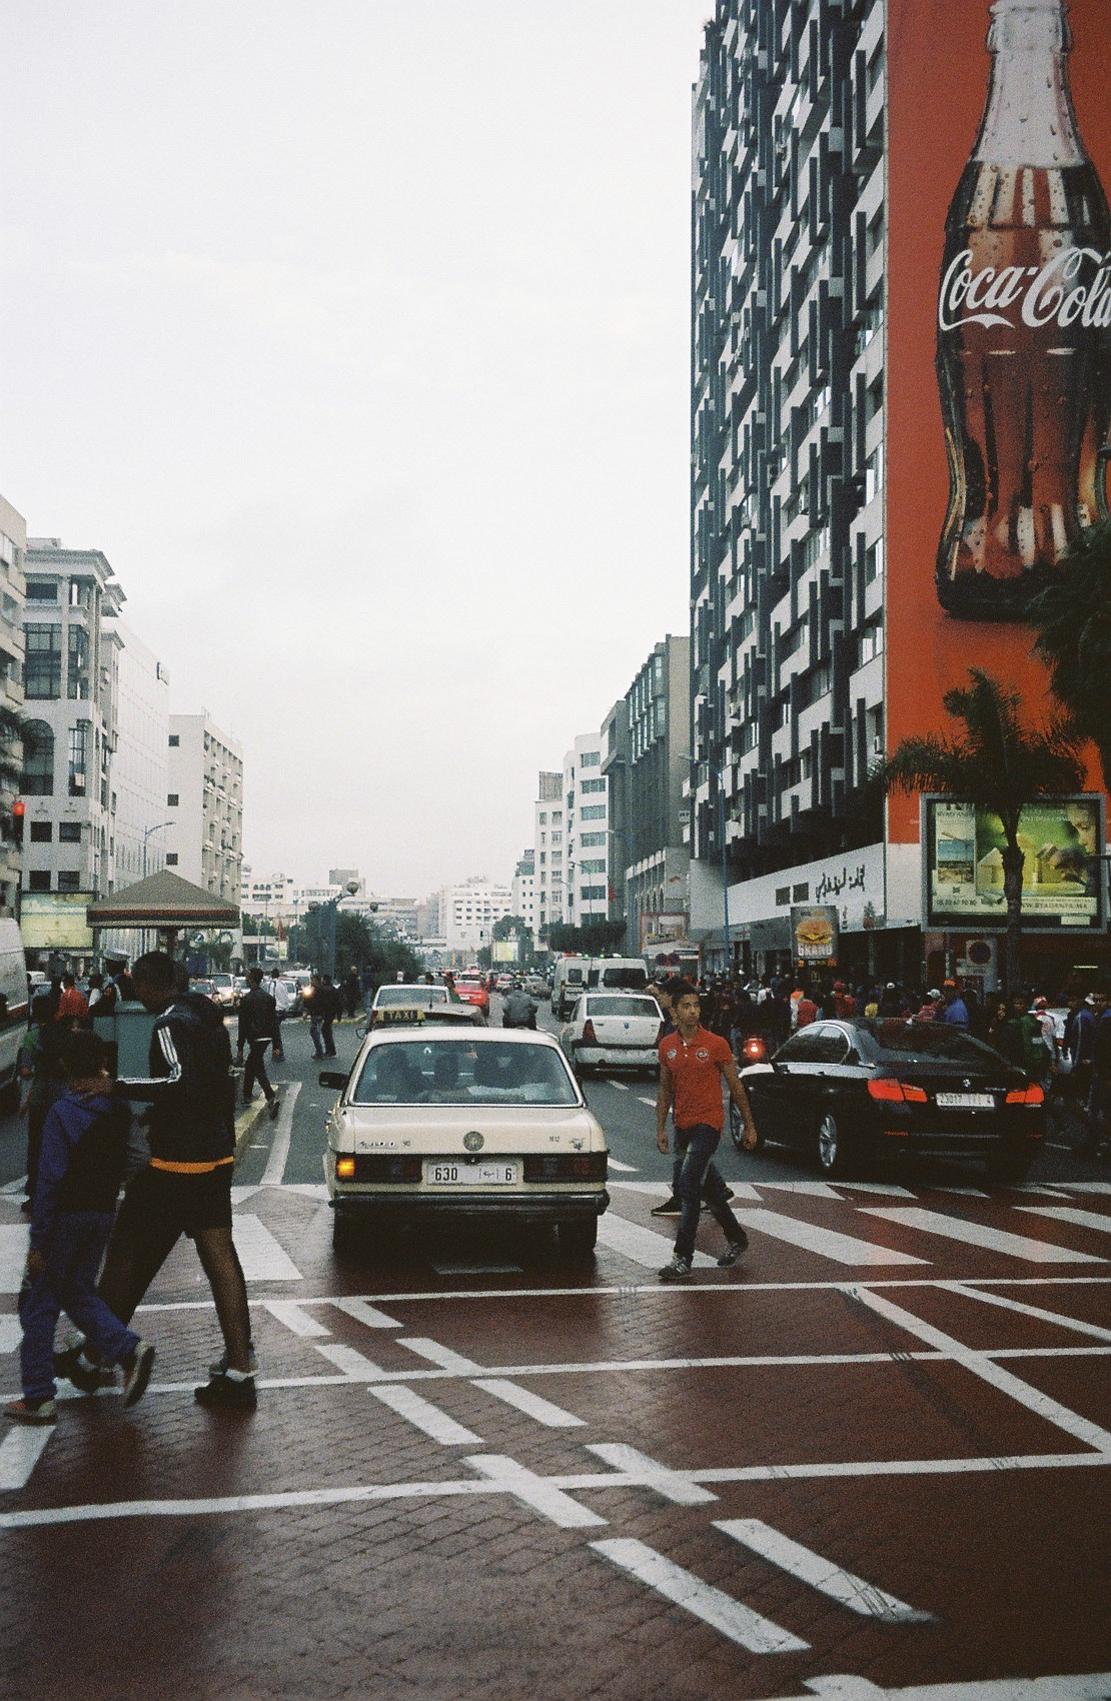 PL_Casablanca_mju-48.jpg